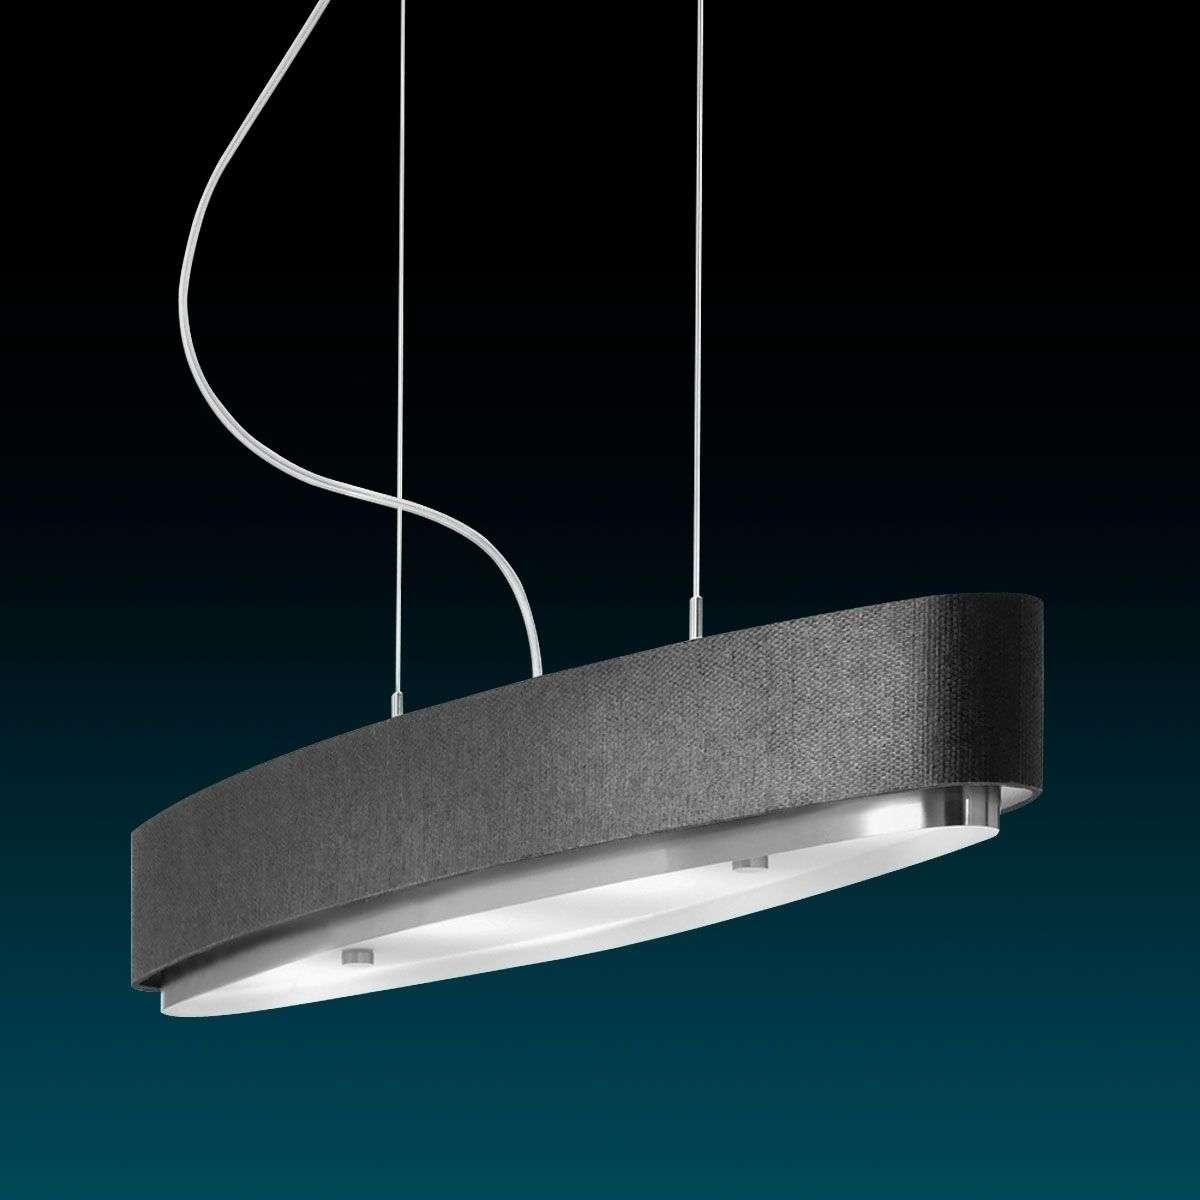 practical lighting. Practical Hanging Light Iris, Length 118 Cm-3027029-31 Lighting